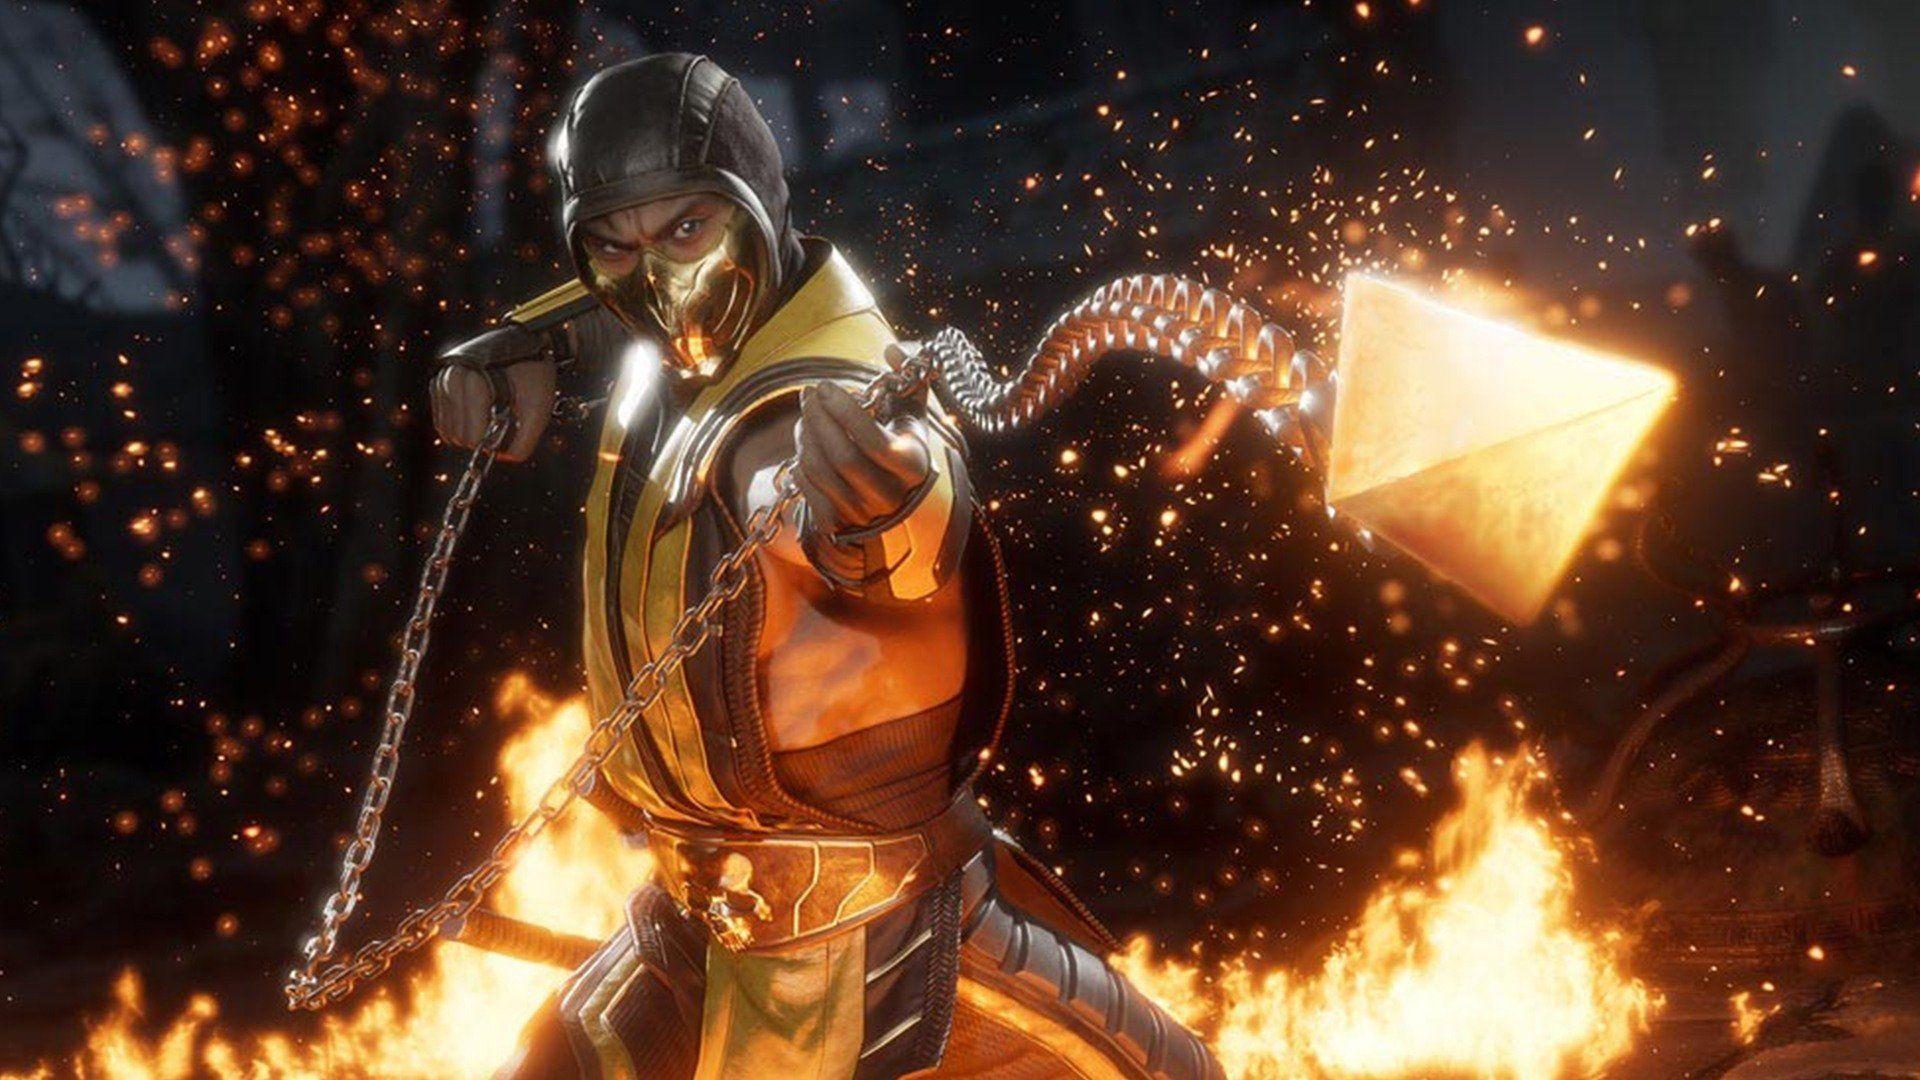 Mortal Kombat 11 Wallpapers Top Free Mortal Kombat 11